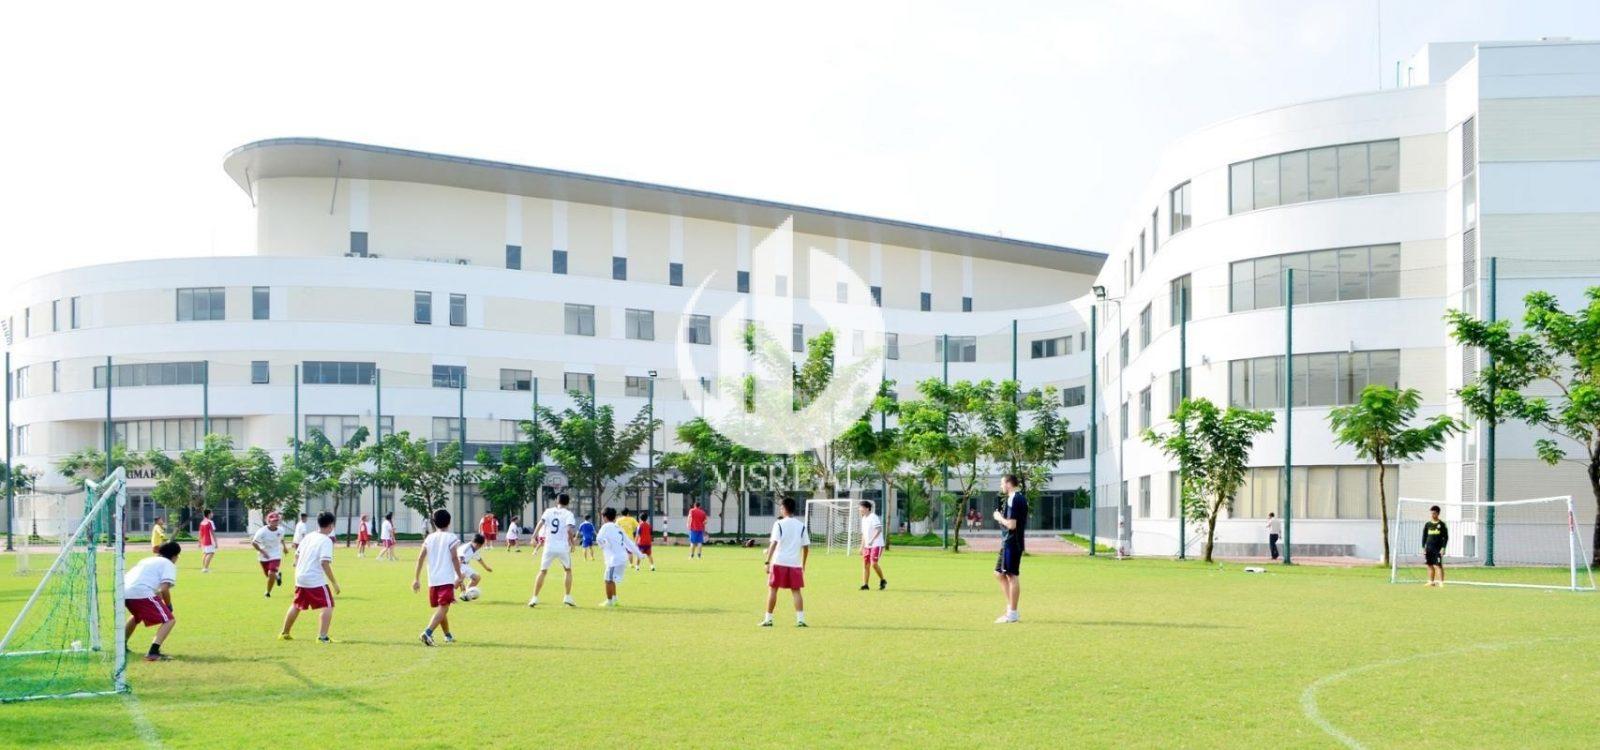 International school in District 2, Ho Chi Minh City